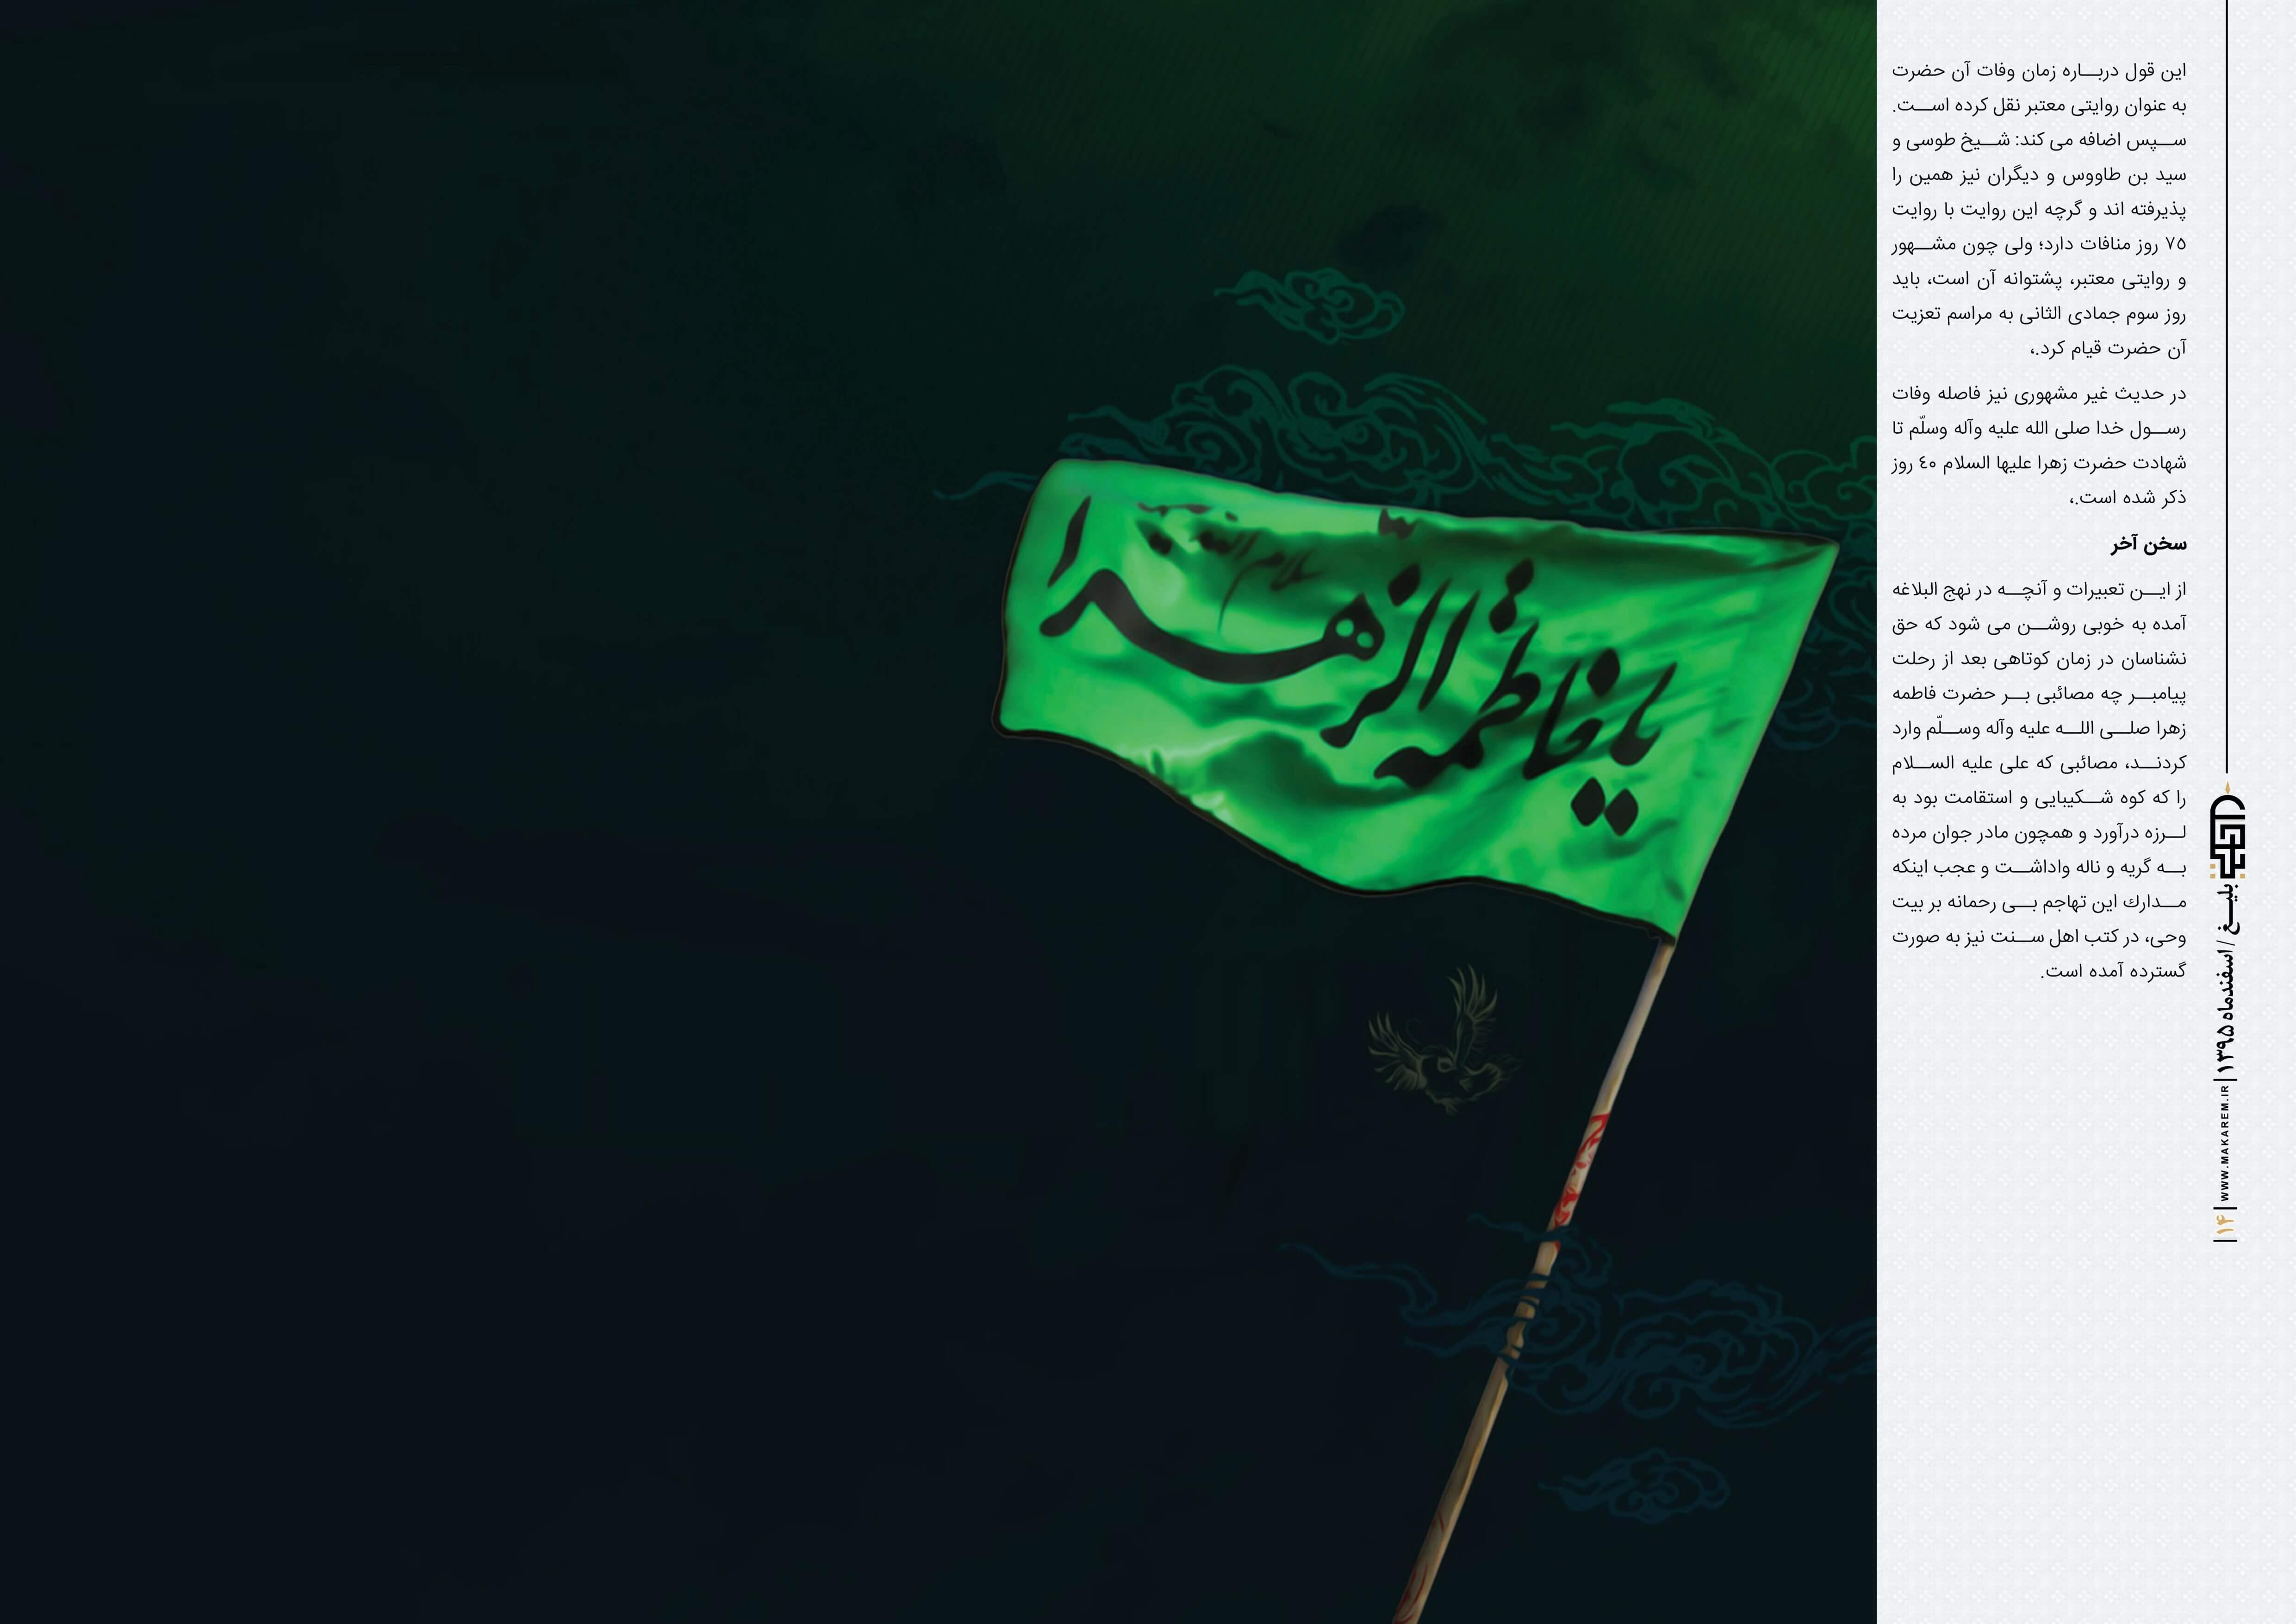 واکاوی ابعاد مظلومیت حضرت زهرا سلام الله علیها از منظر معظم له-مدرسه الامام امیر المومنین (ع)